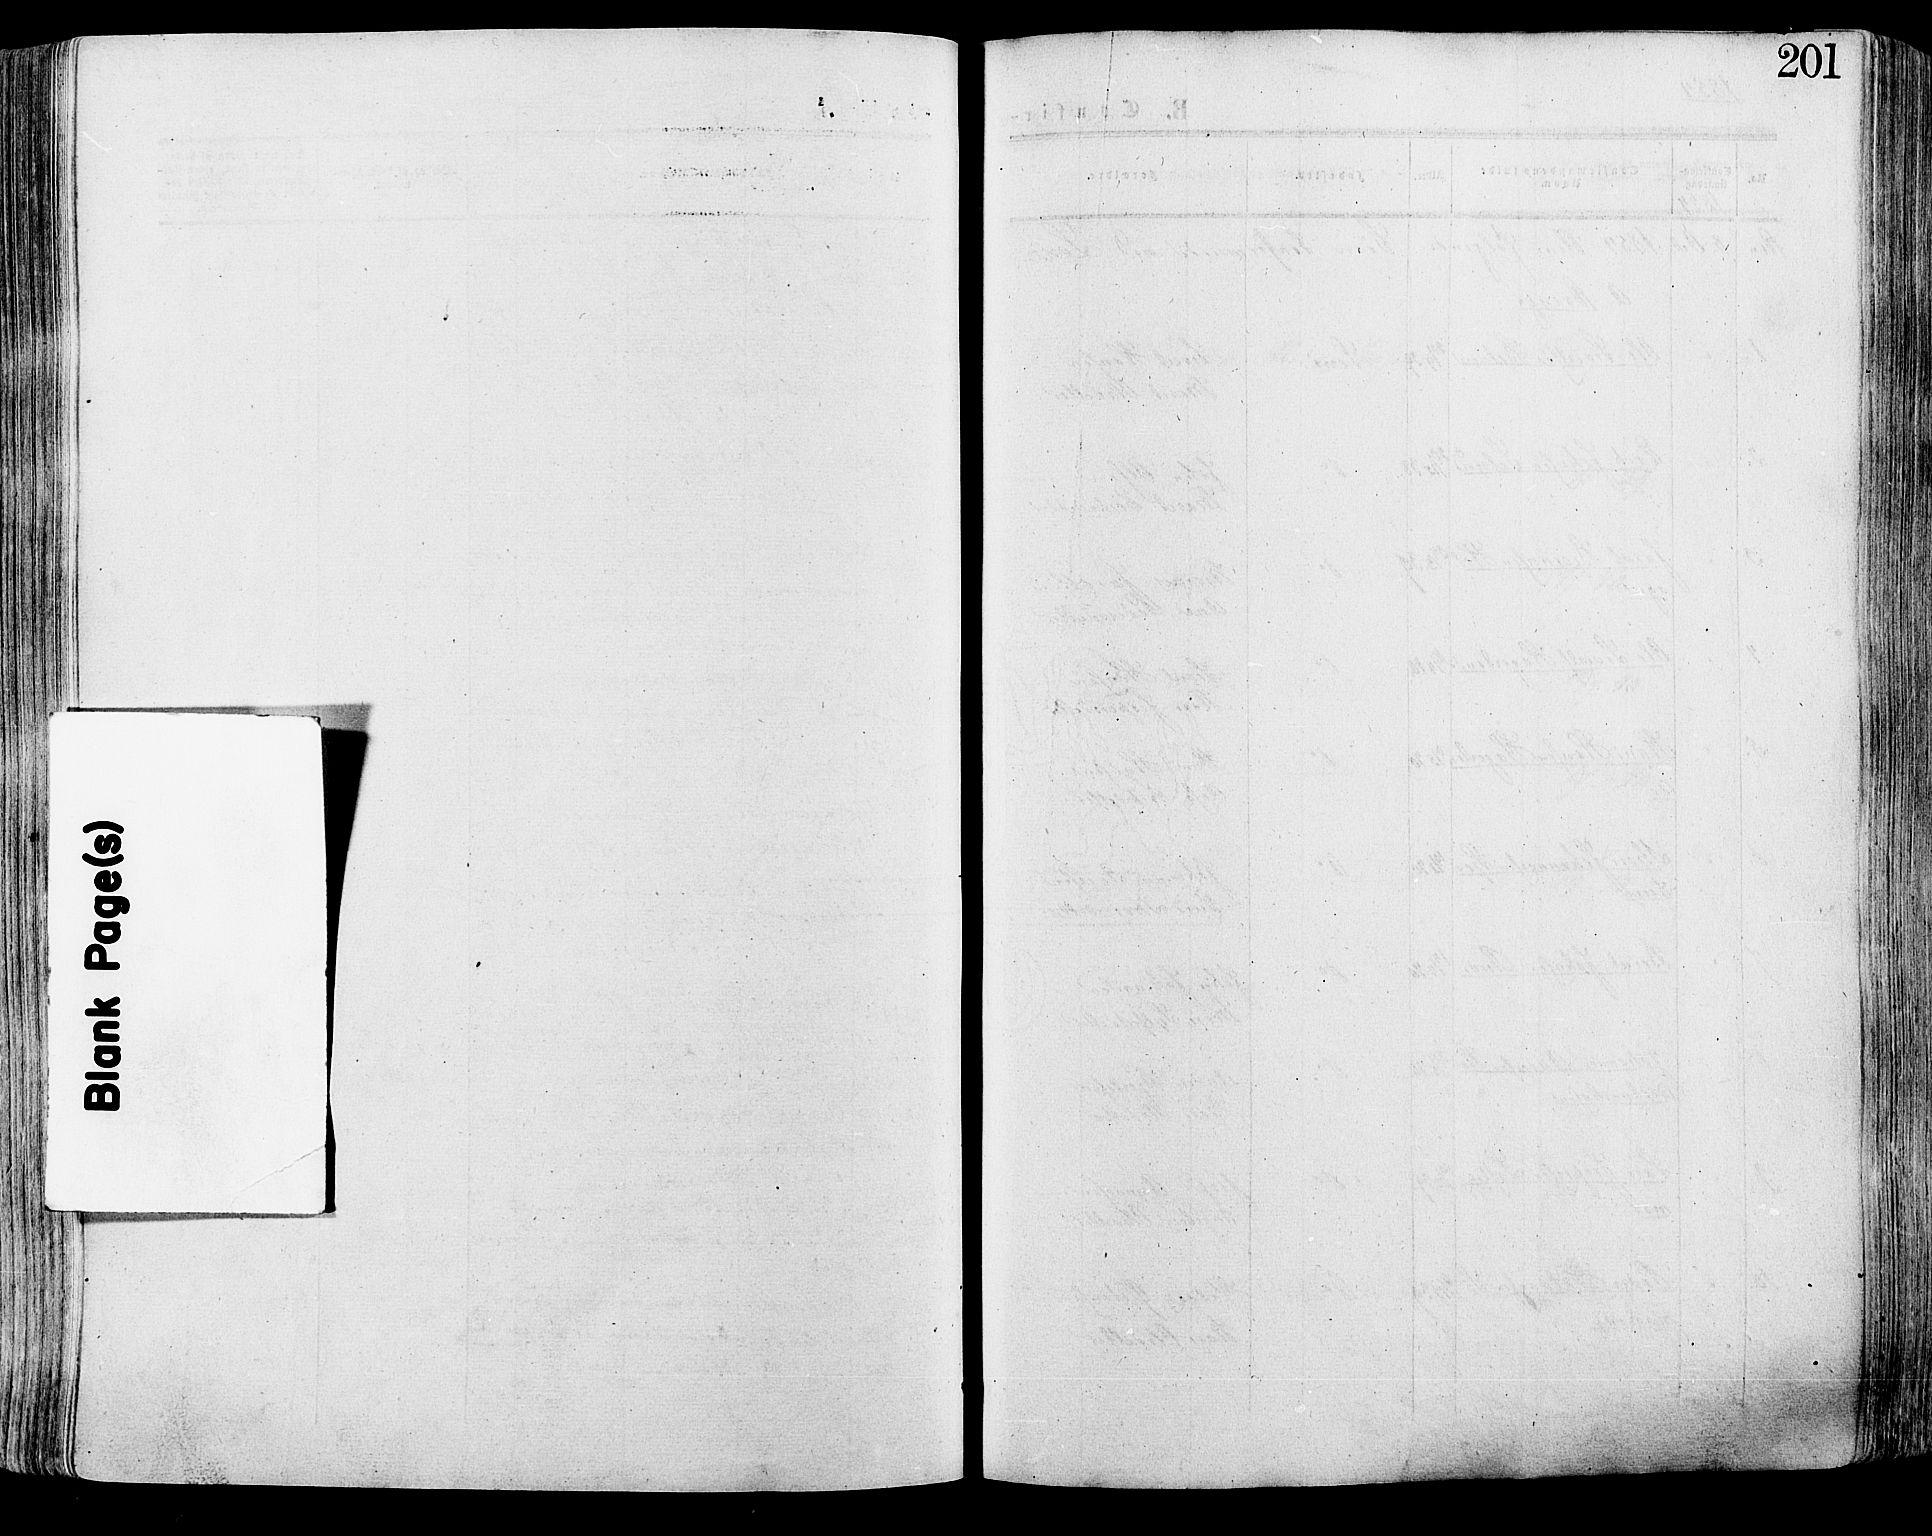 SAH, Lesja prestekontor, Ministerialbok nr. 8, 1854-1880, s. 201